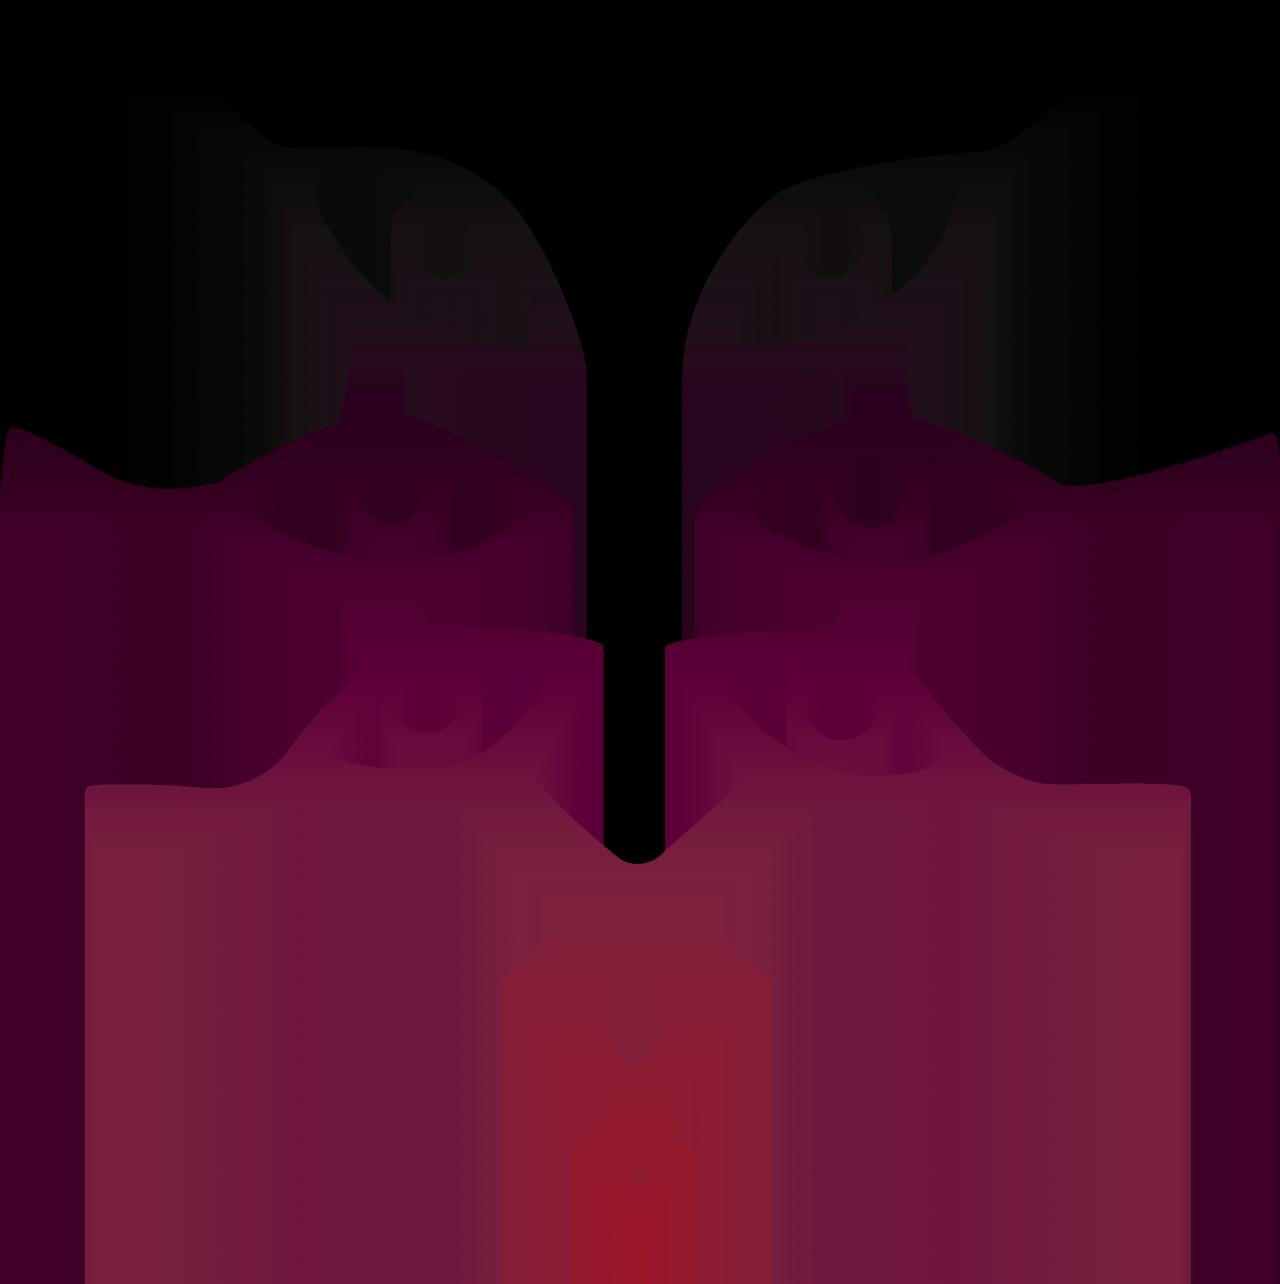 Tumblr Static A5vhej5uz1cgos8csggo4gcgs Png 1280 1284 Yandere Fire Emblem Awakening Hand Symbols